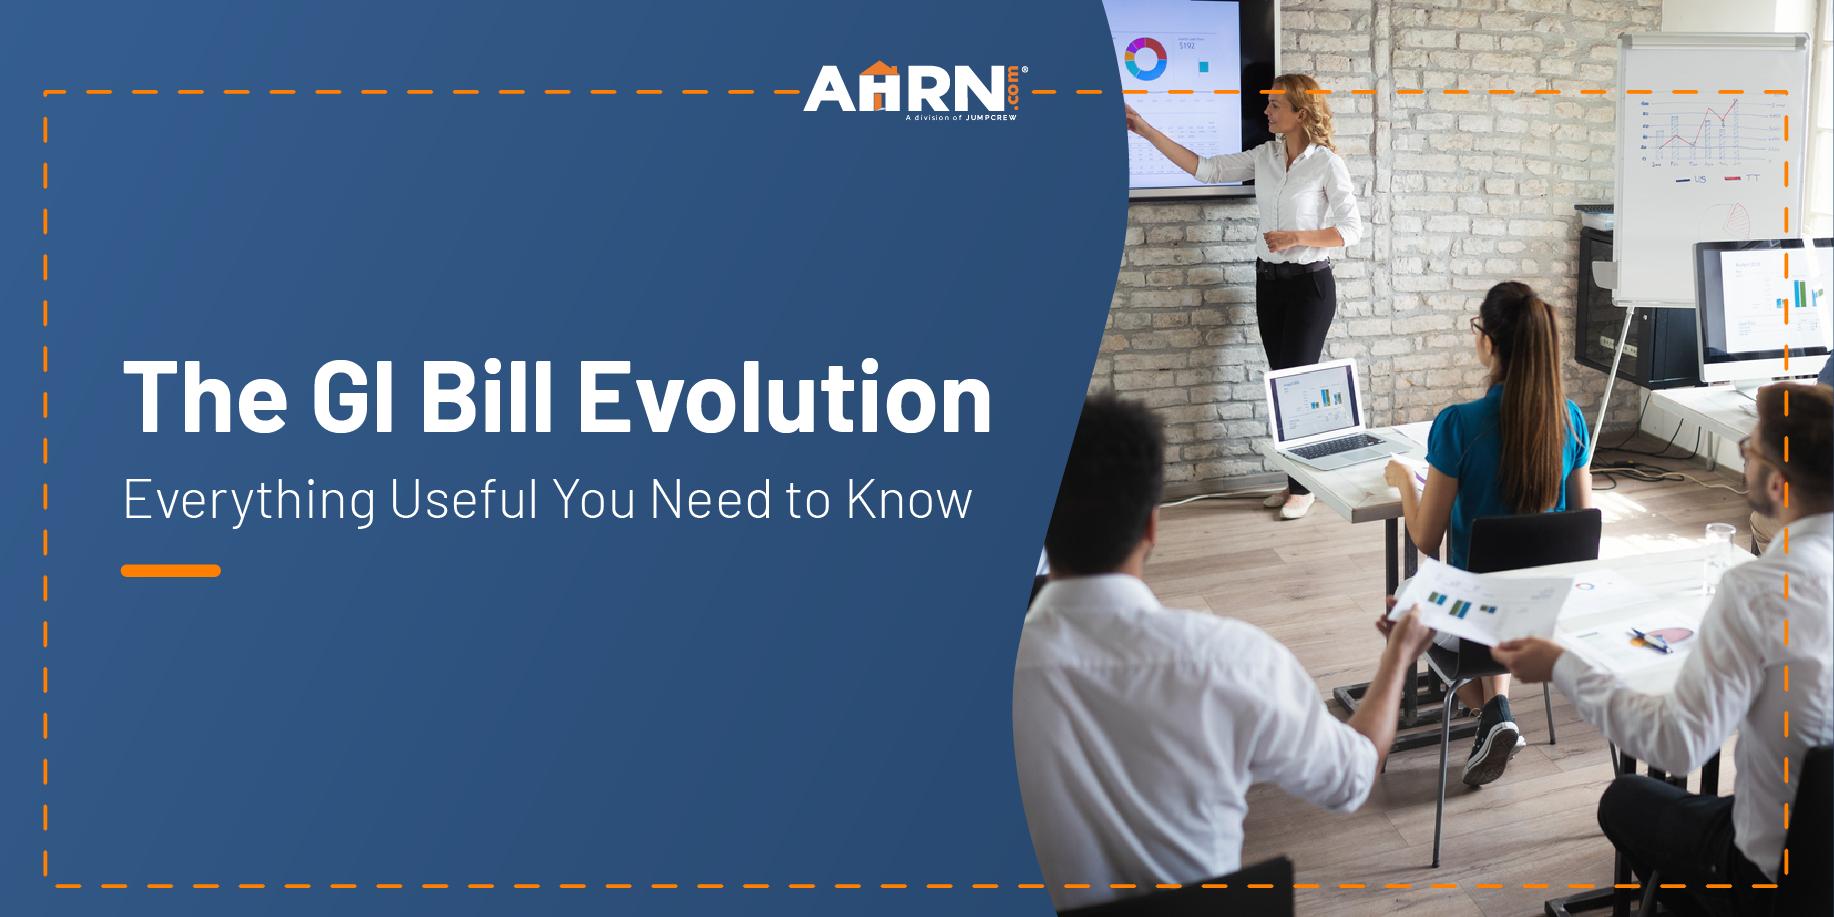 The GI Bill Evolution